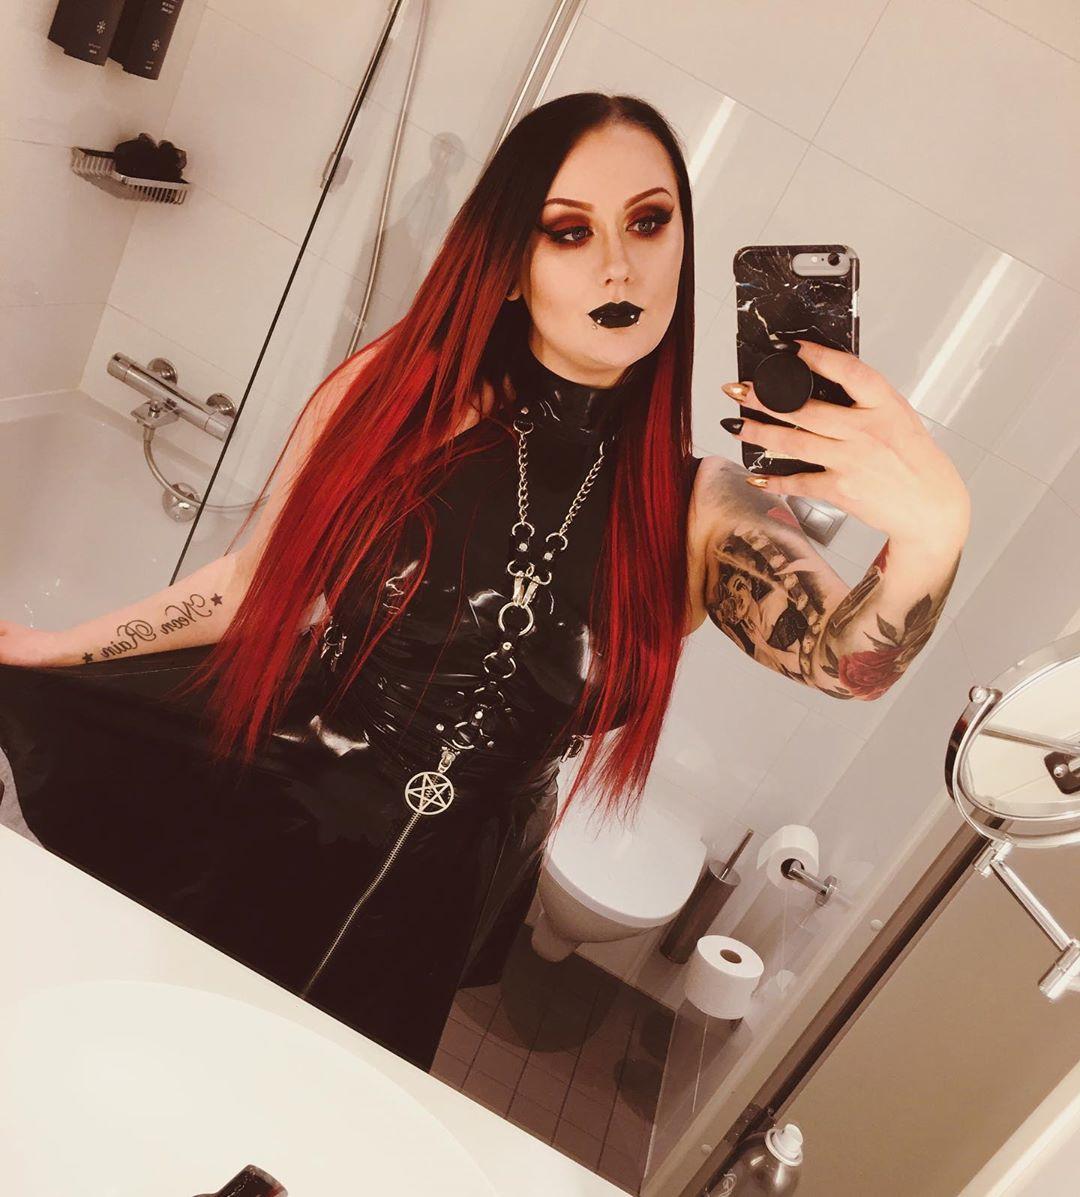 I Had So Much Fun Yesterday At Jyväskylä Postgigdepression - Tattoos